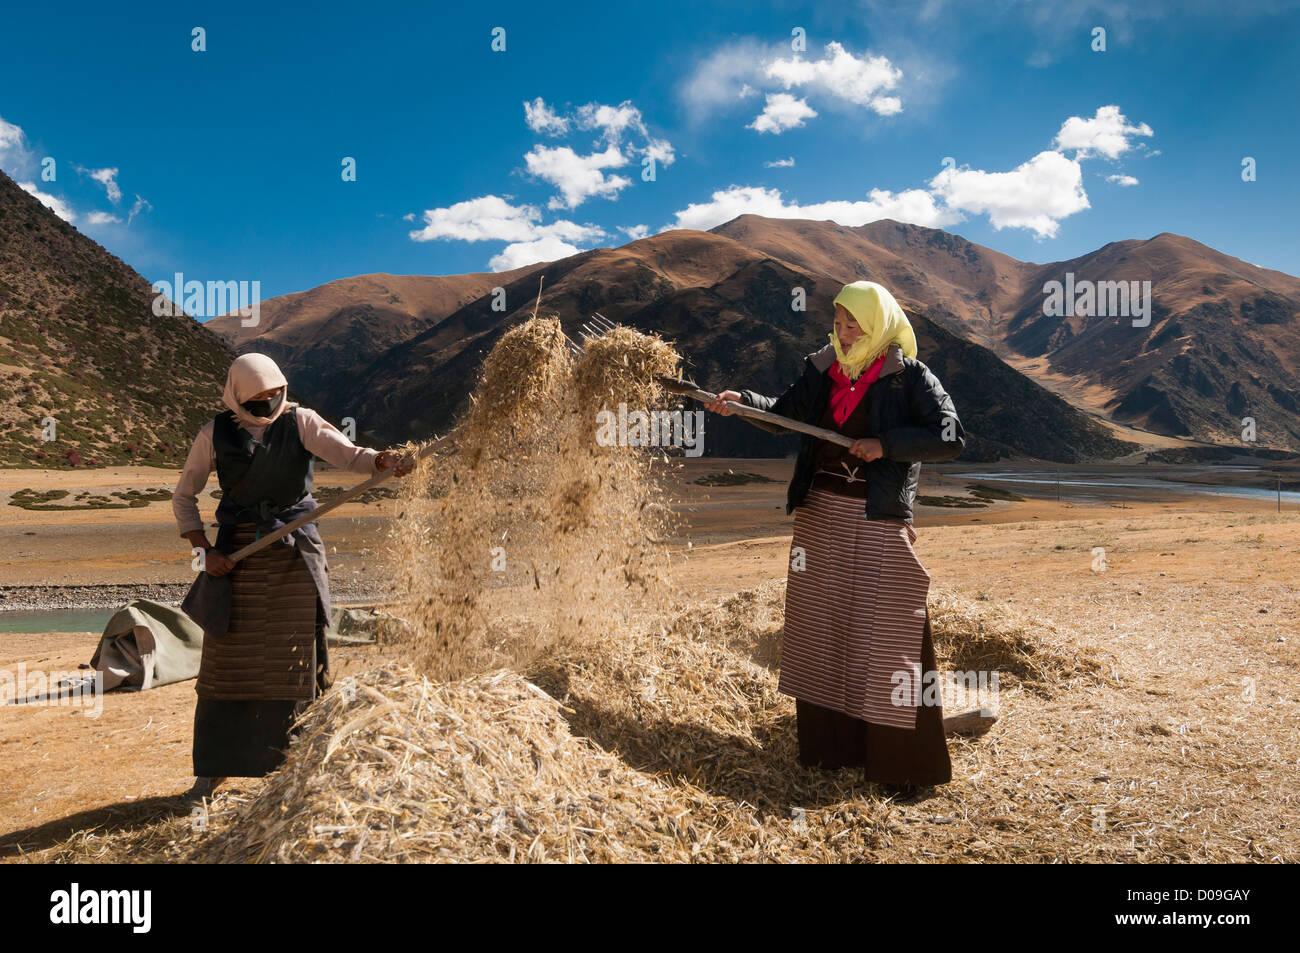 Women thresh grain by hand after Fall harvest, near Lhasa, Tibet - Stock Image